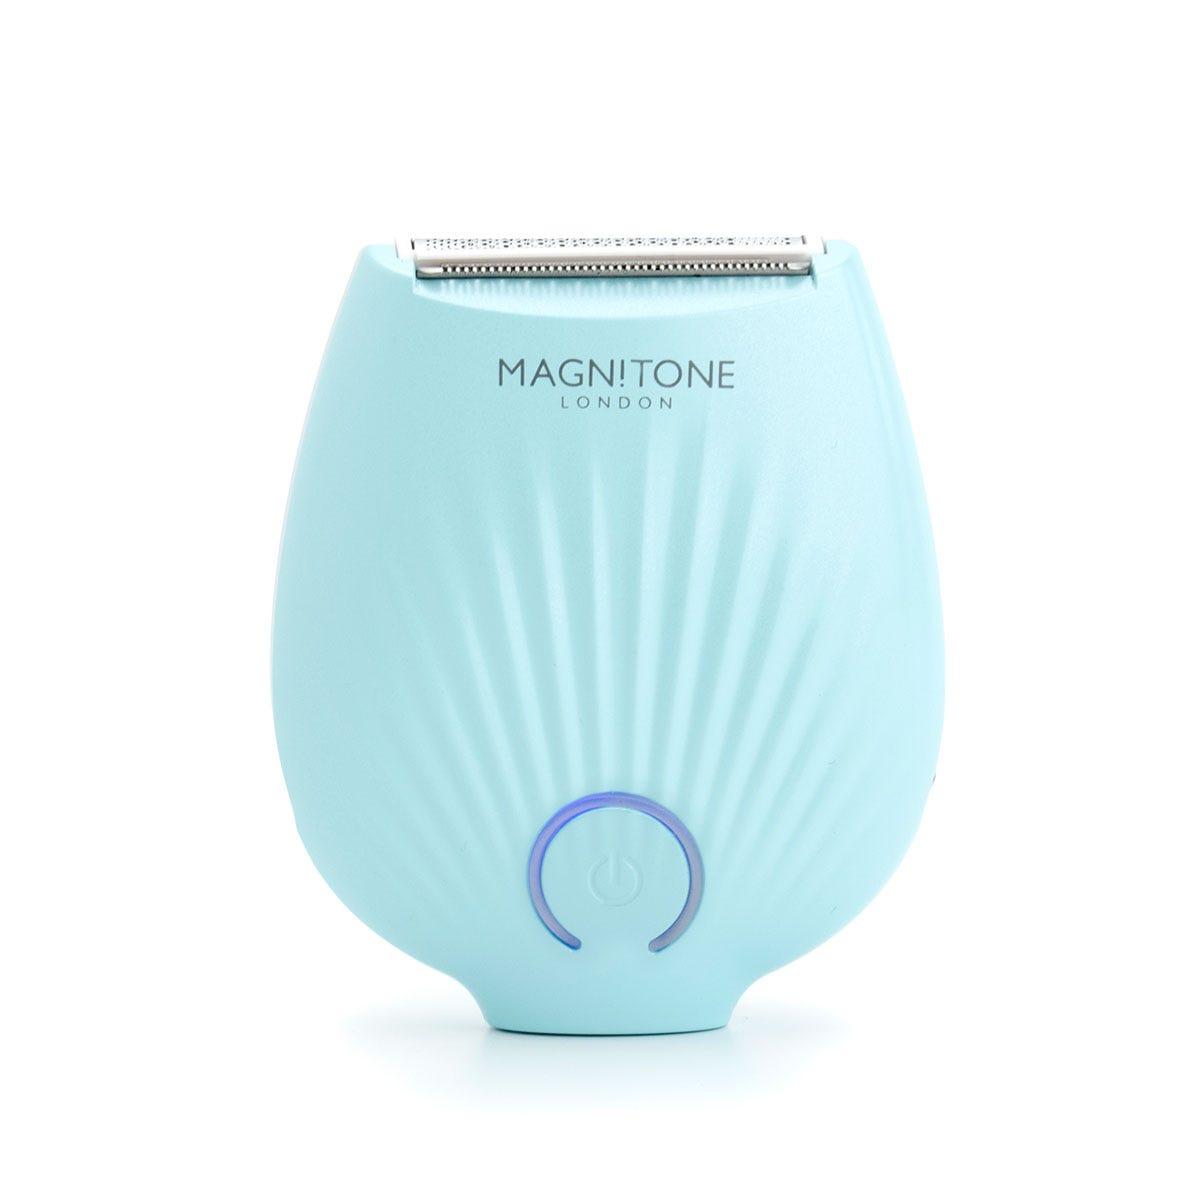 Magnitone MLS01PG GoBare Mini Rechargeable Lady Shaver - Aqua